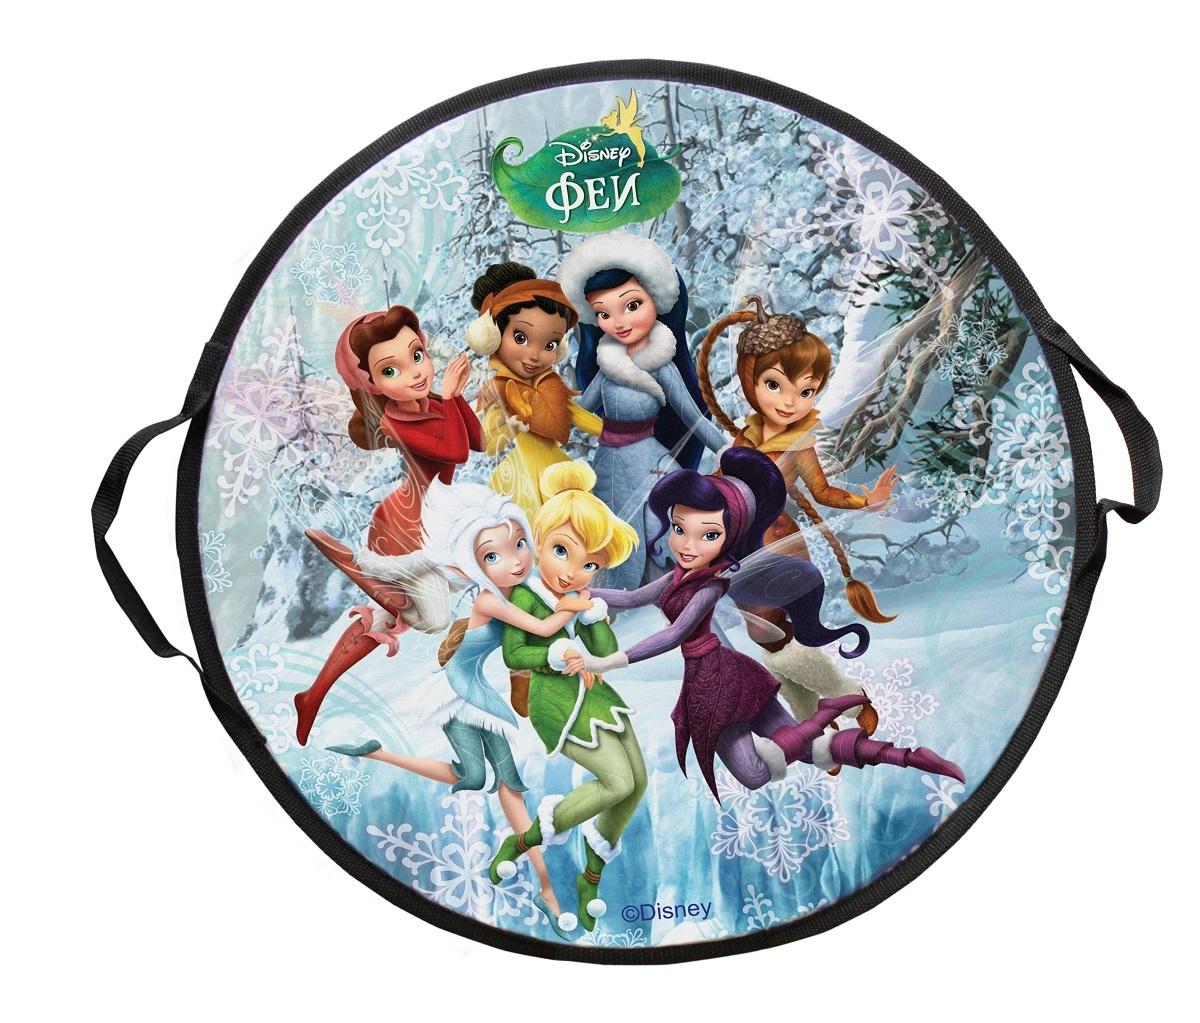 Ледянки Disney Fairies Фея disney fairies кукла фея розетта